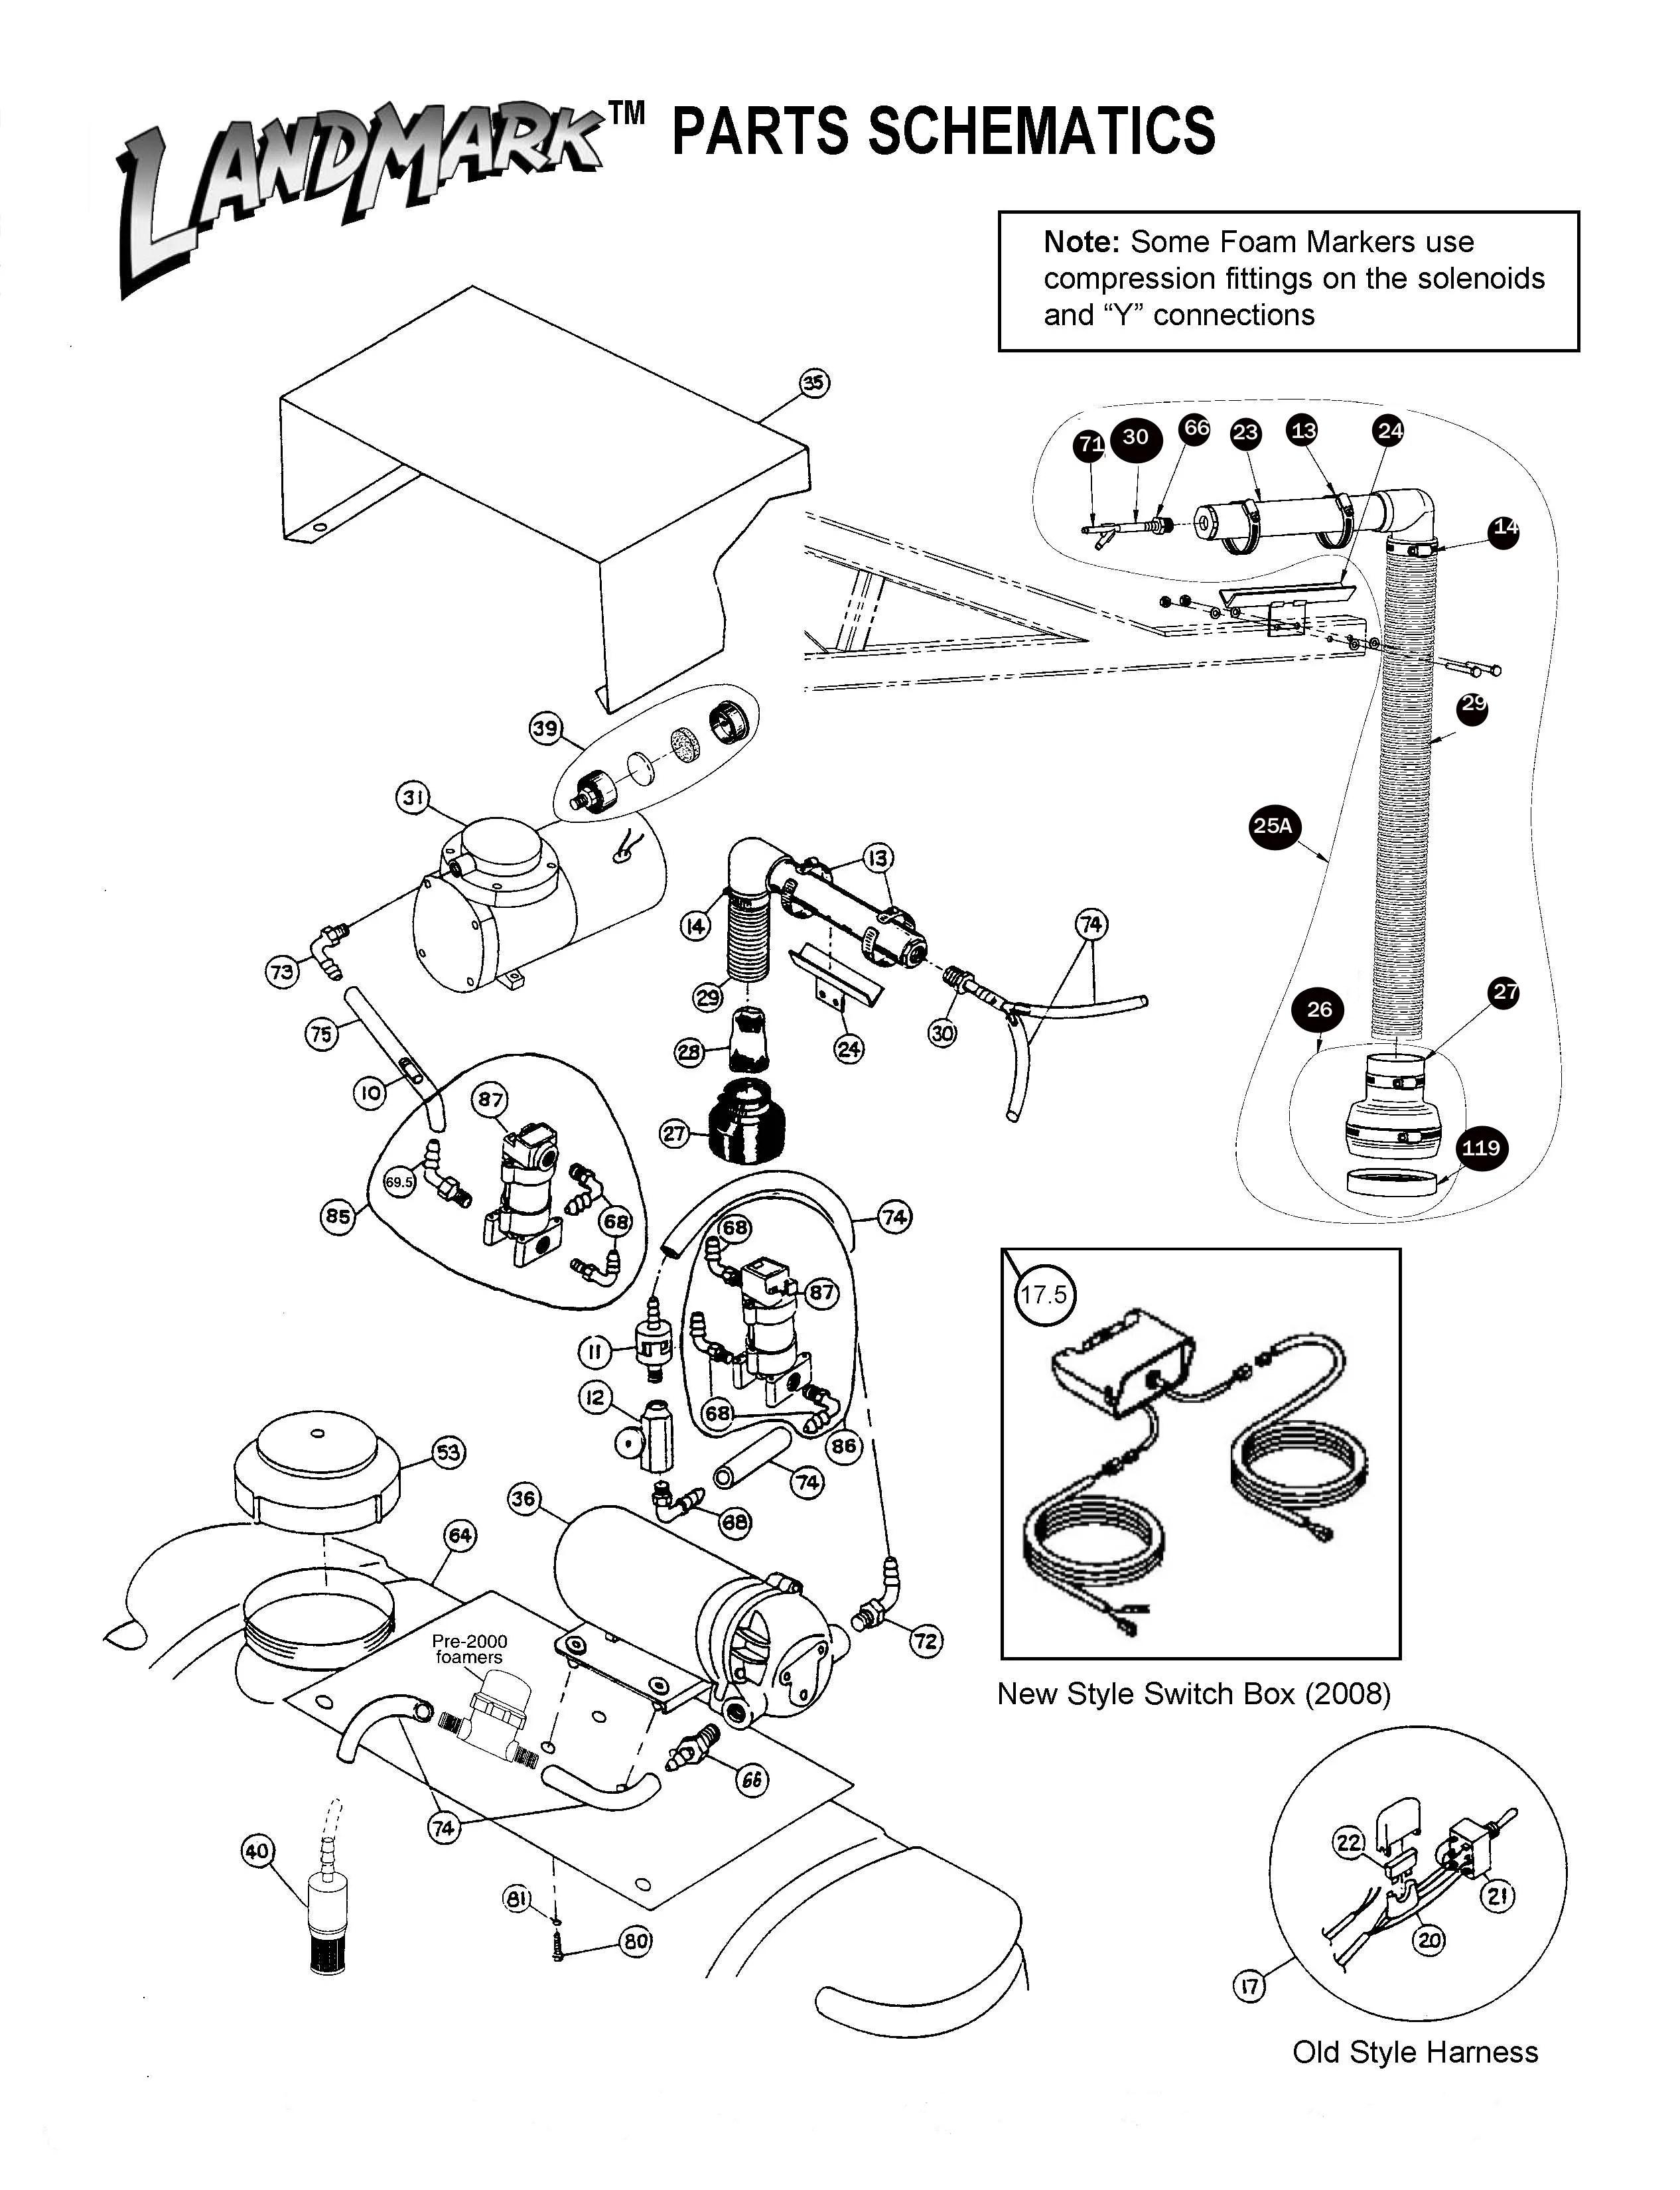 Landmark Foam Marker Replacement Parts